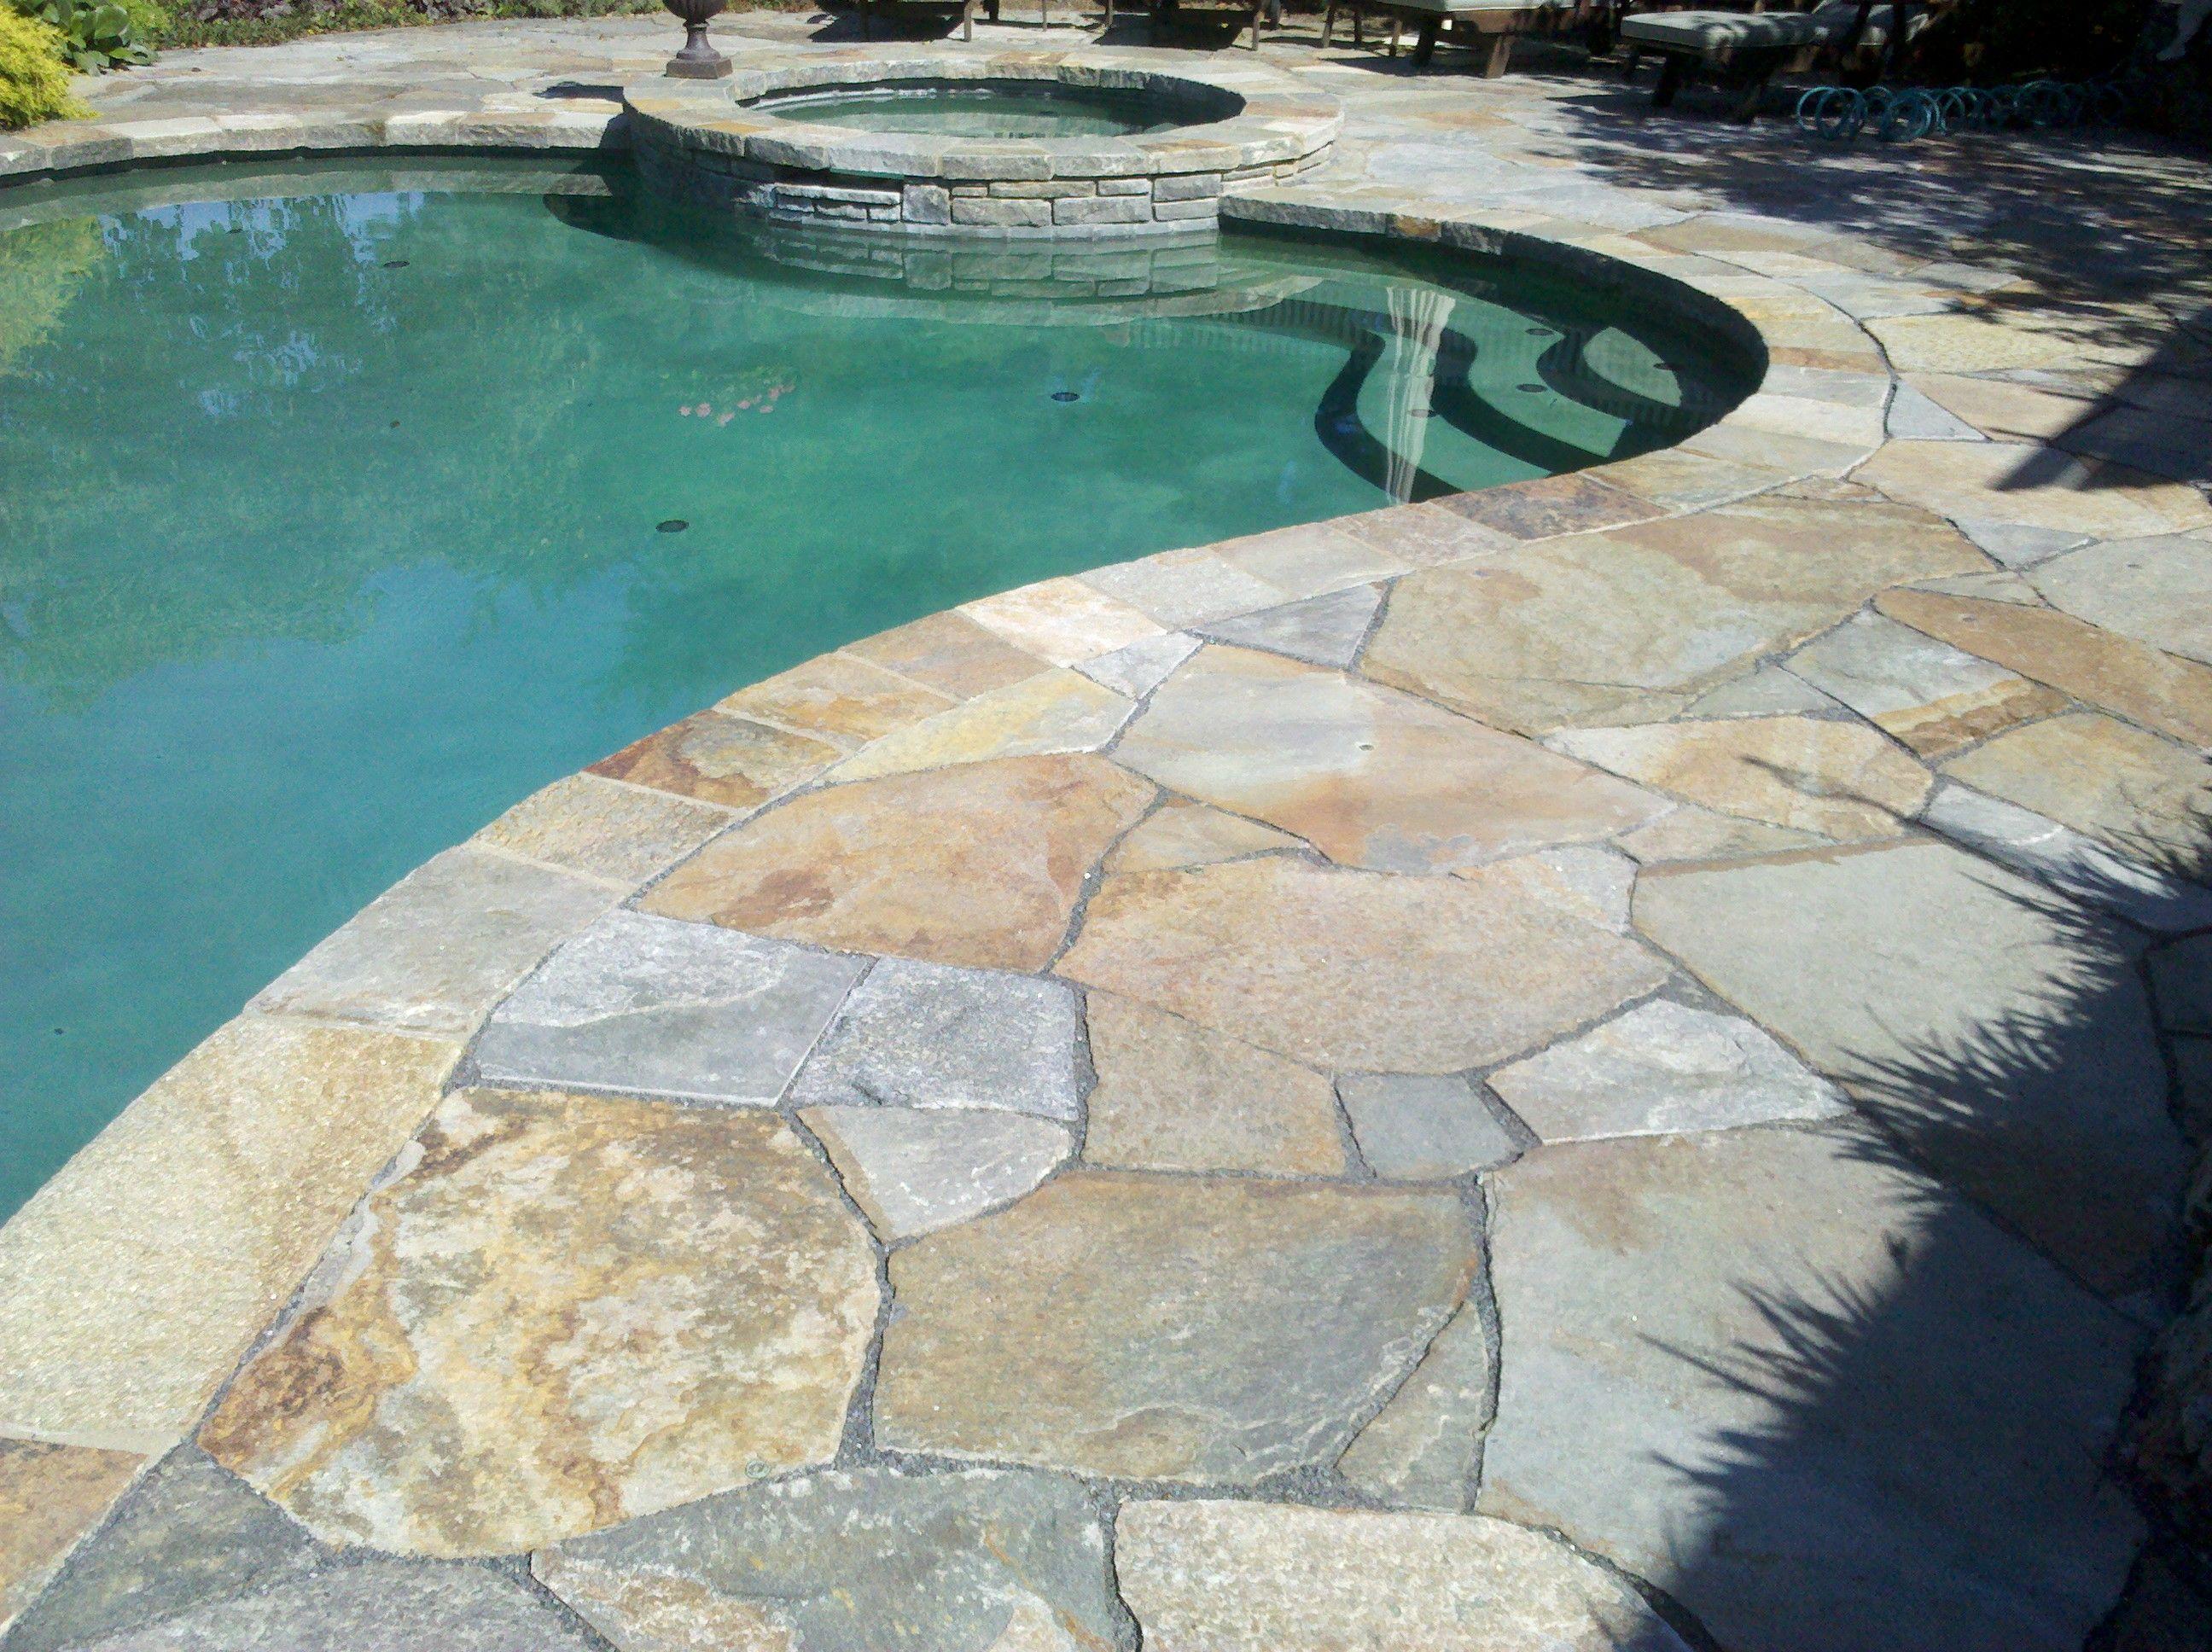 Natural Stone Pool Deck White Marble Pool Deck  Google Search  Mykonos  Pinterest